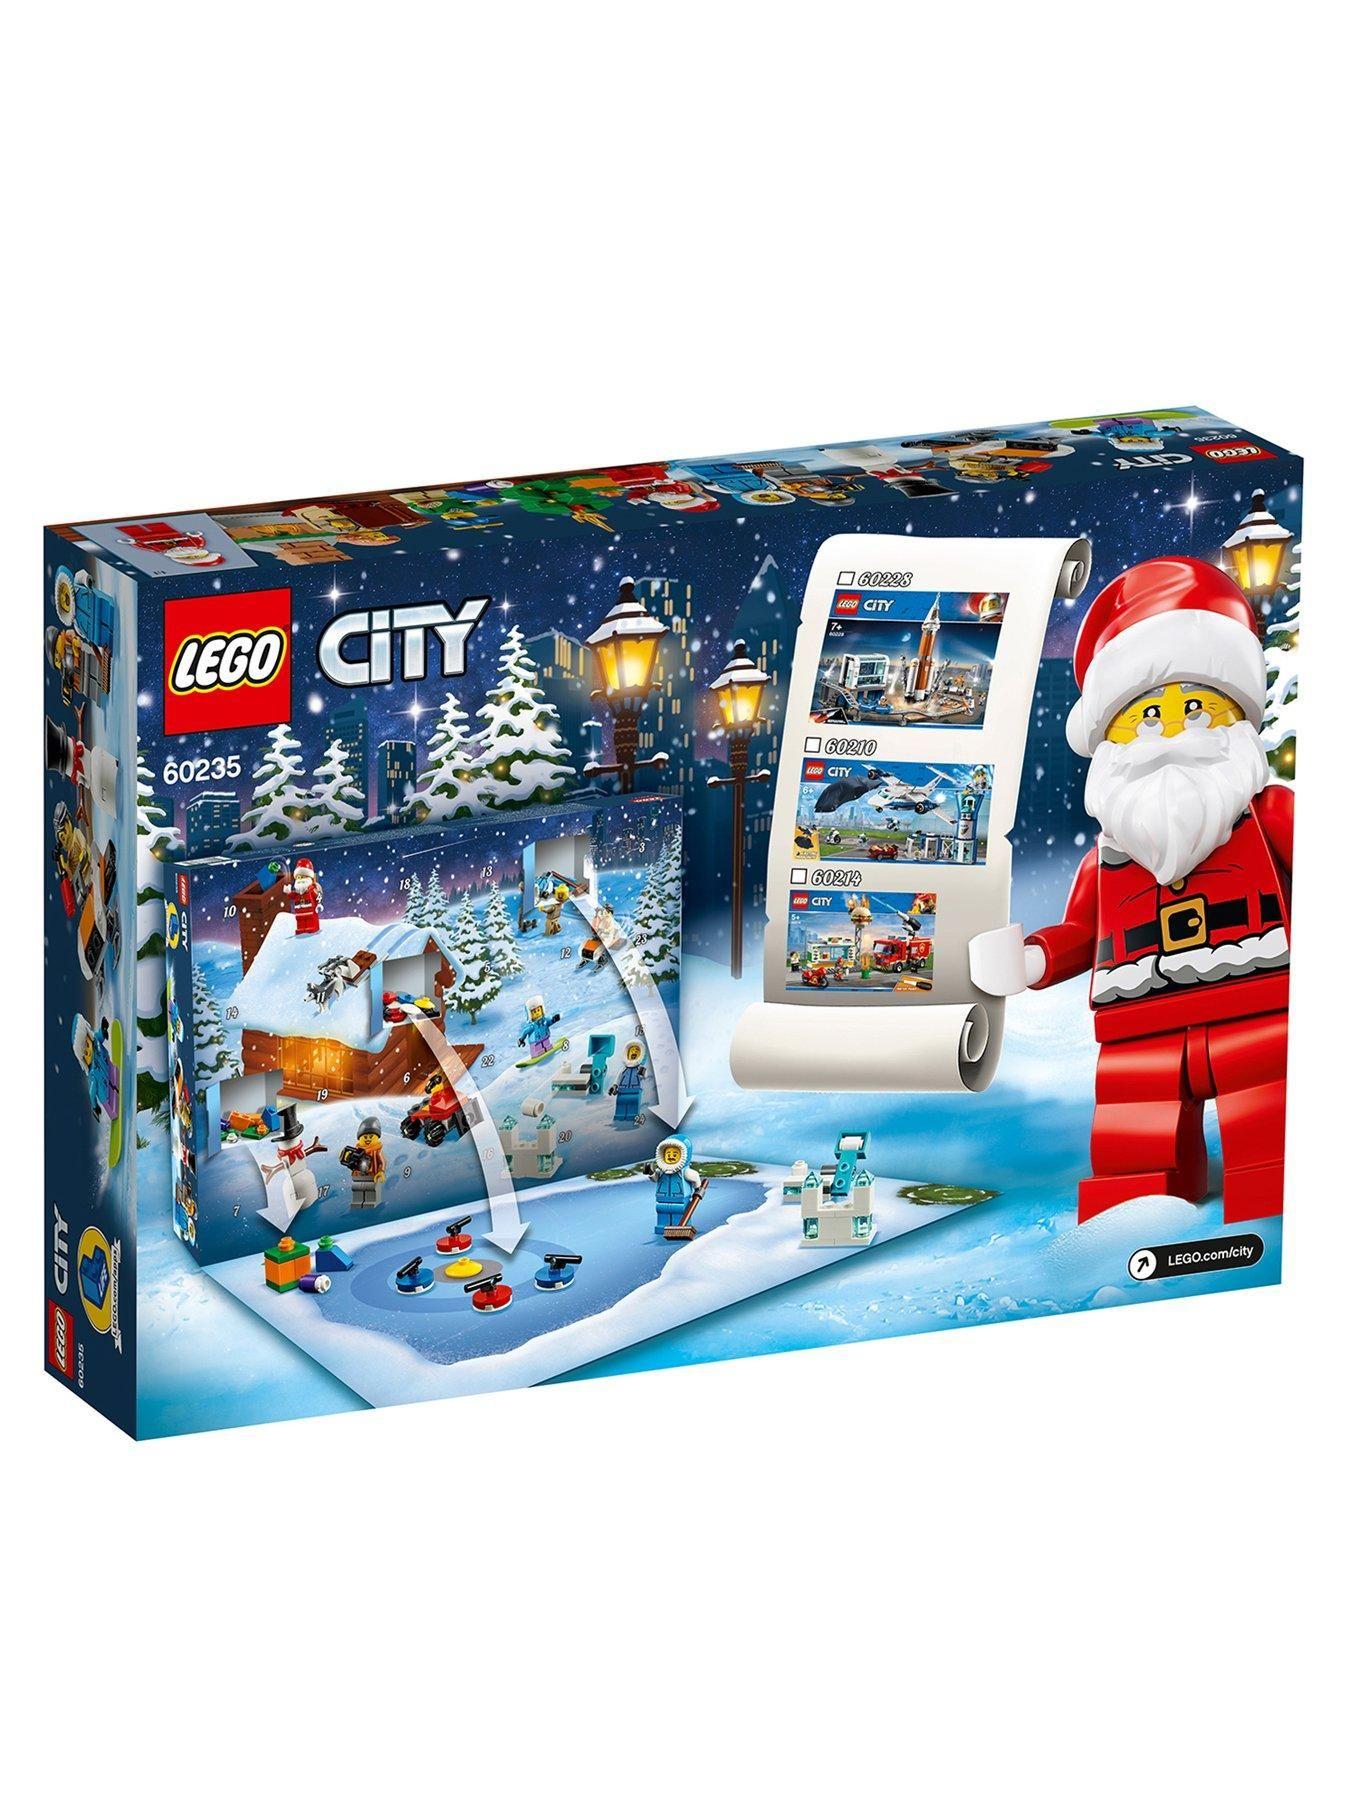 Lego City 60235 Advent Calendar 2019 With Father Christmas